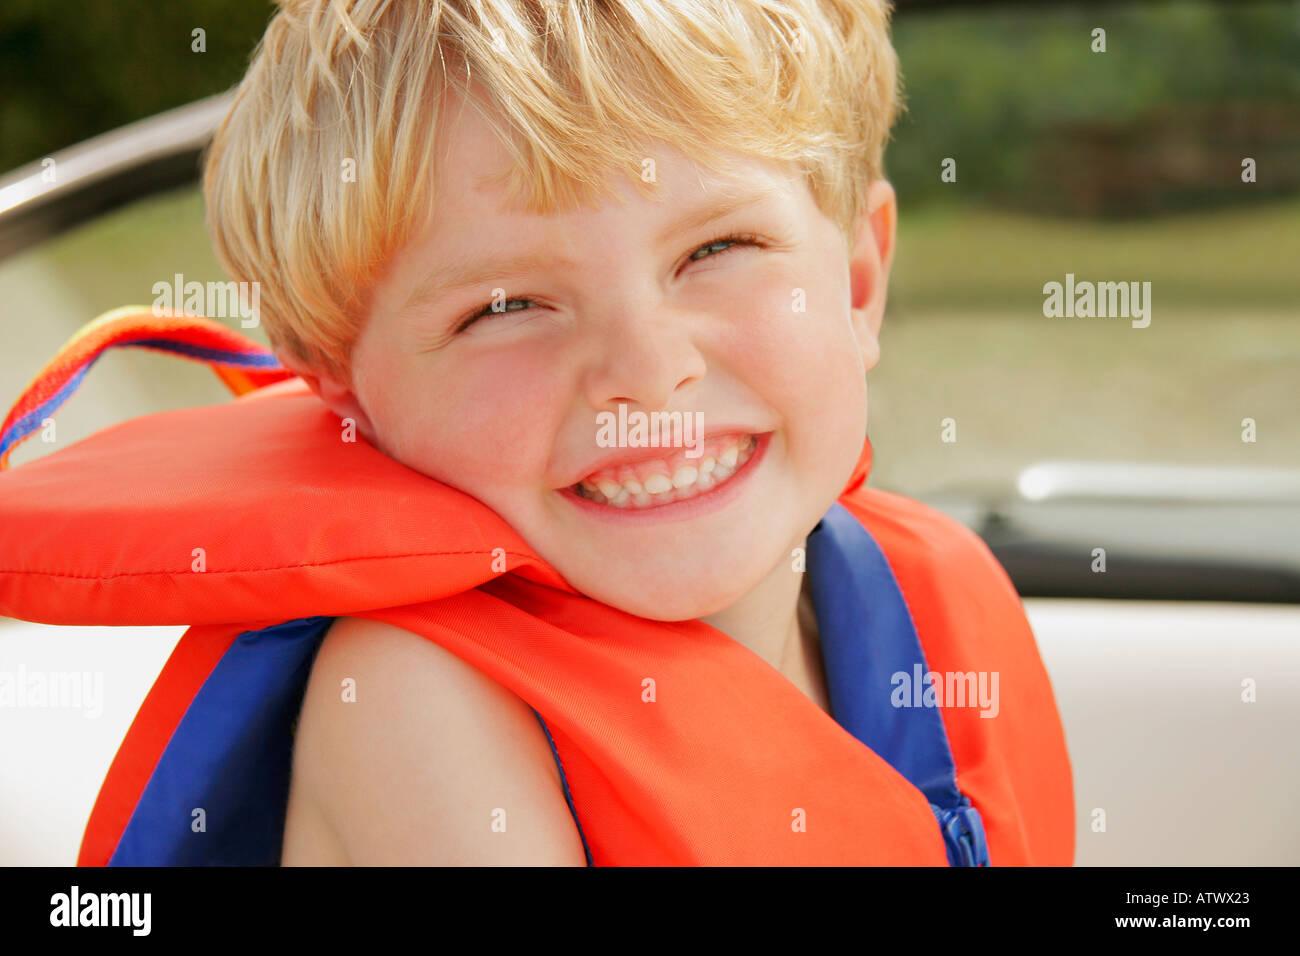 A Happy Little Boy Wearing A Life Jacket Stock Photo